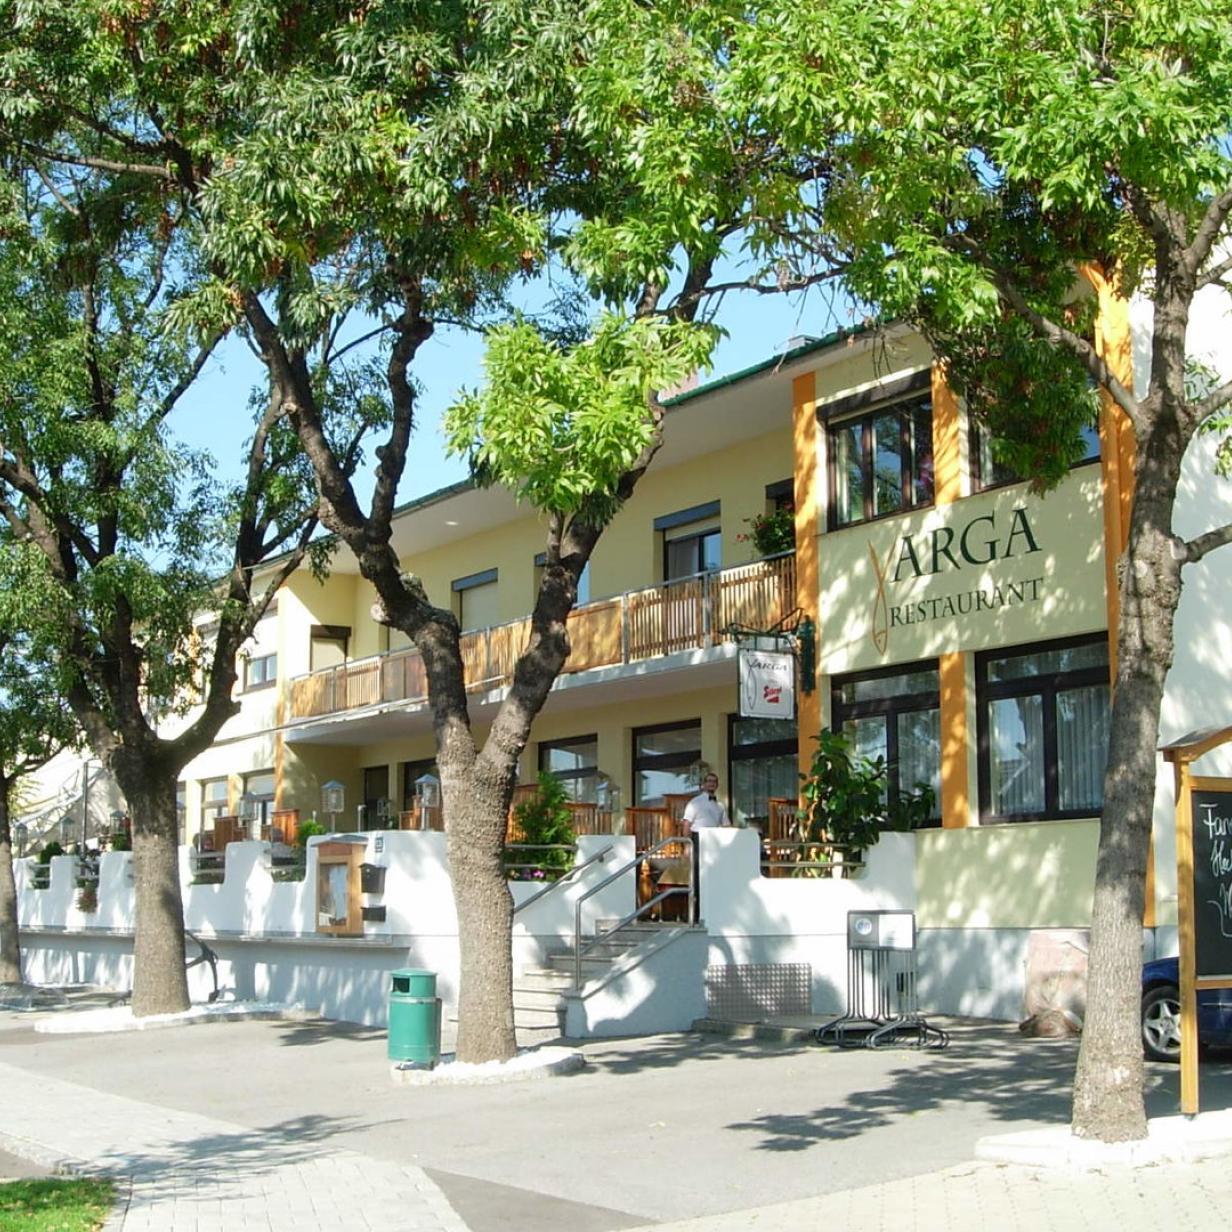 Das beliebte Fisch-Restaurant Varga am Neusiedler See sperrt zu